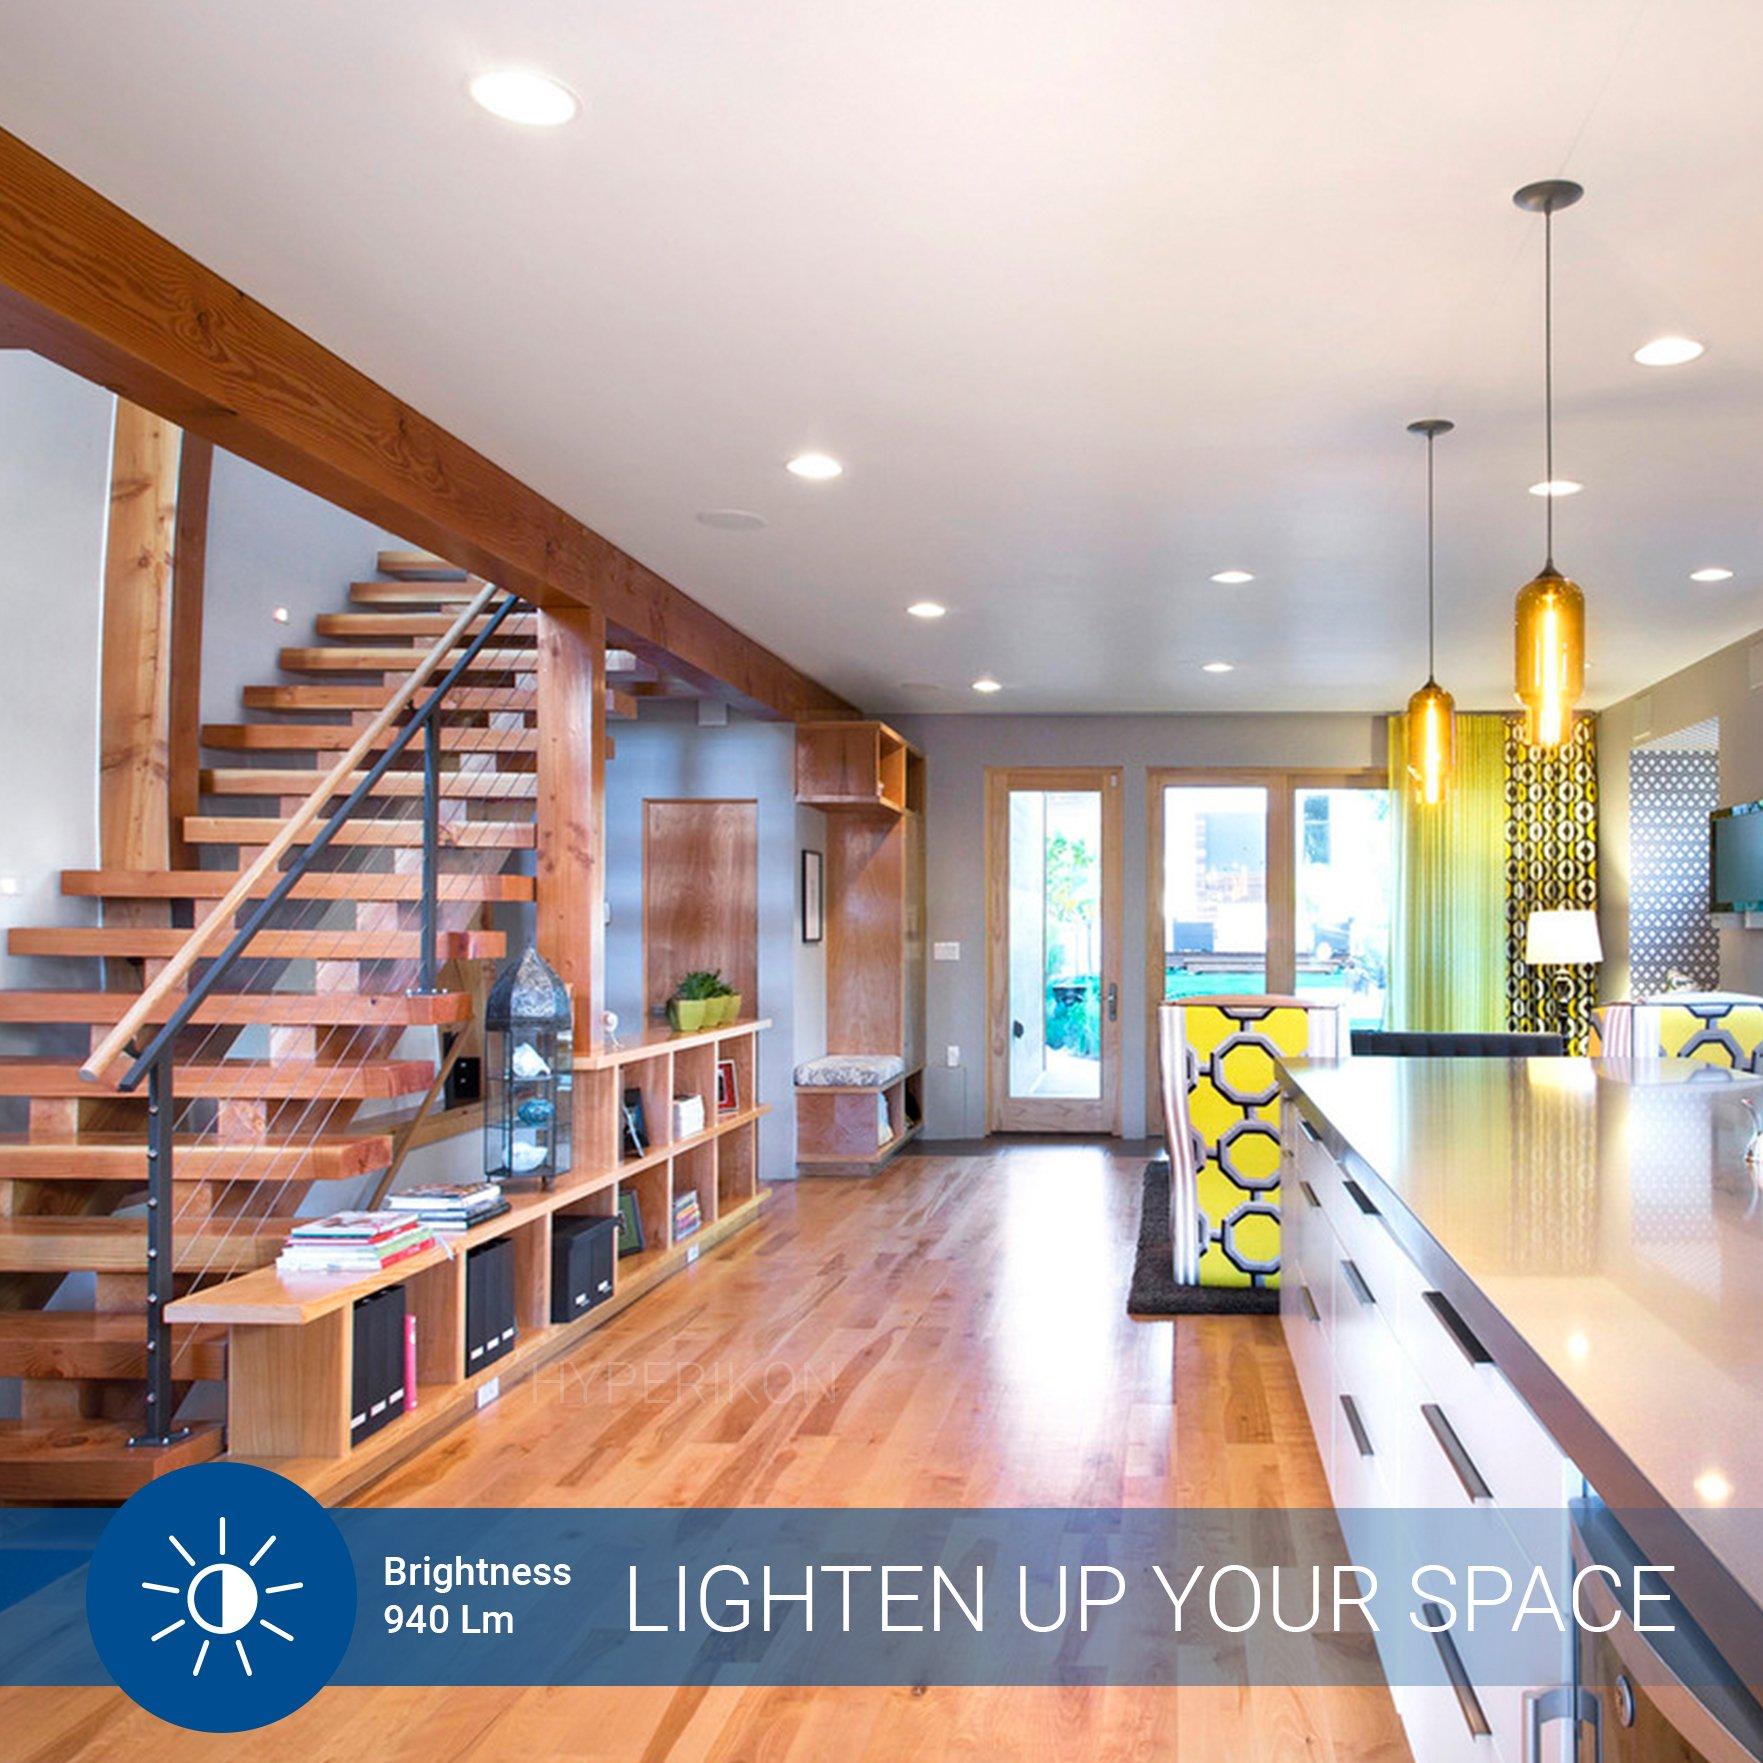 Hyperikon PAR30 Short Neck LED Bulb, Dimmable, 10W (65W Equivalent), 4000K (Daylight Glow) 840 lm, CRI 90+, Flood Bulb, Medium Base (E26), UL & Energy Star - Great for Work Areas, Kitchen (6 Pack) by Hyperikon (Image #4)